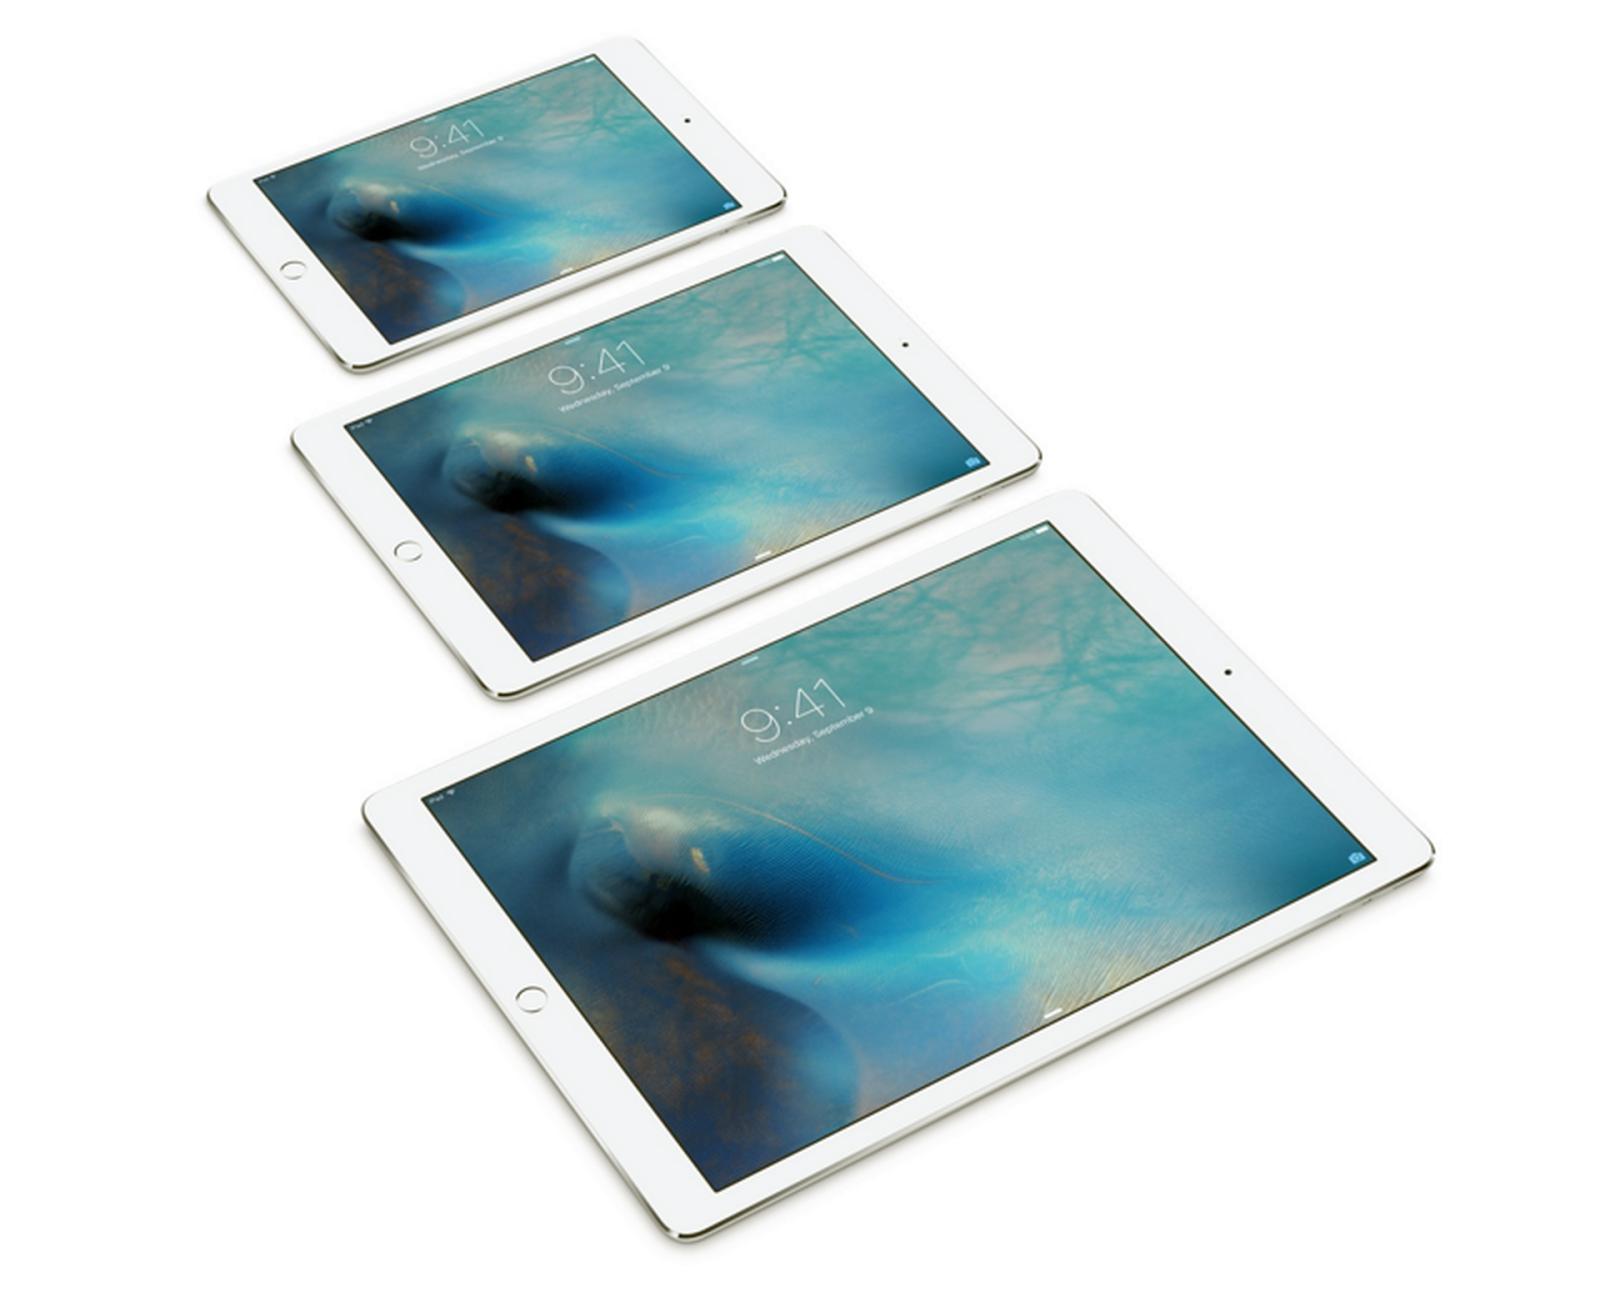 How to Customize iPad Pro Mini